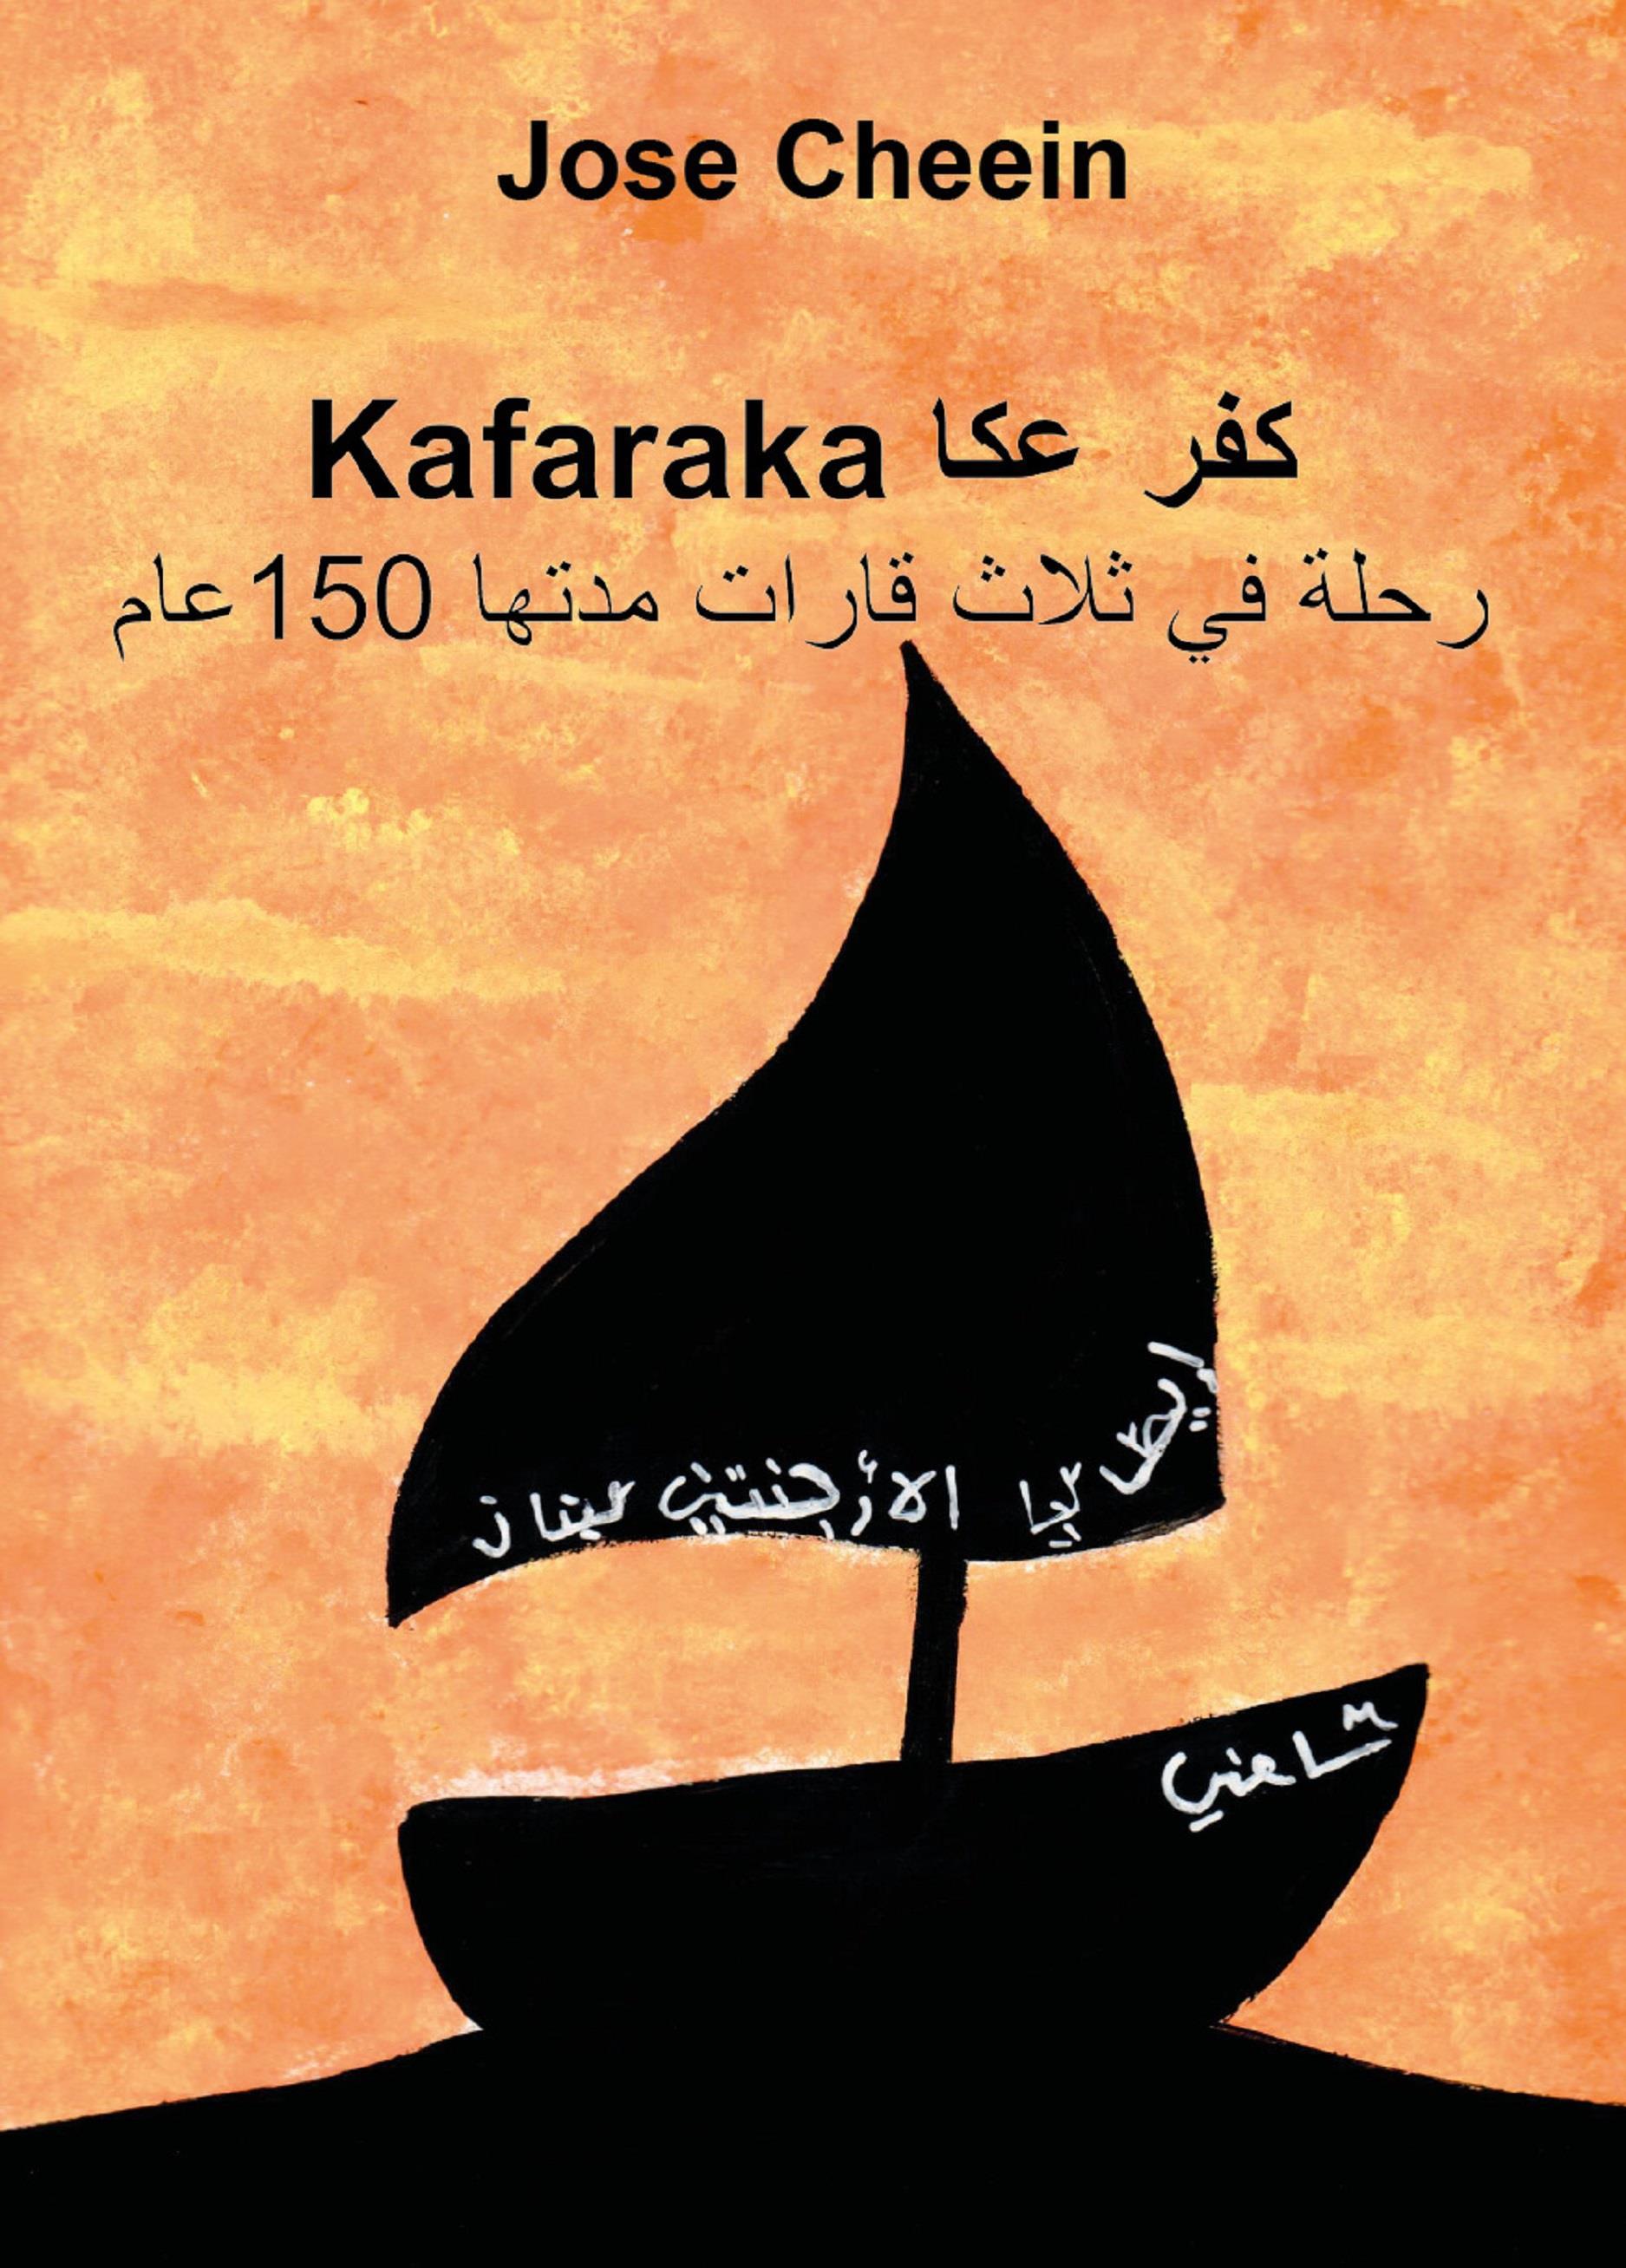 Kafaraka.  رحلة في ثلاث قارات مدتها 150عام